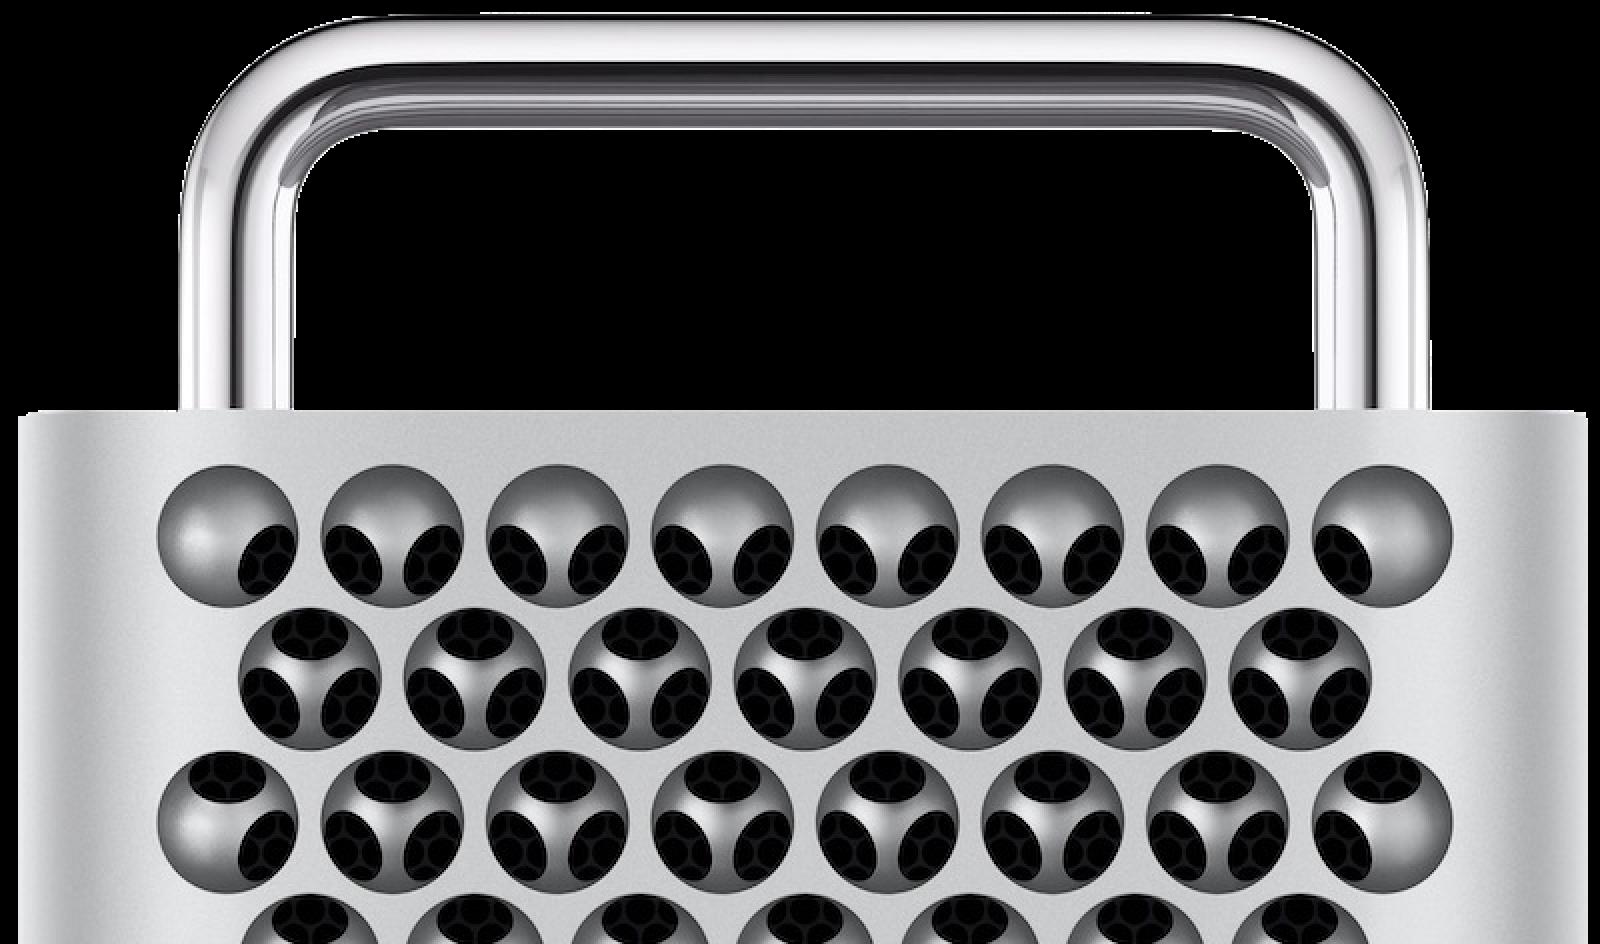 Mac Pro Spotted in Studio of DJ Calvin Harris Ahead of Launch - MacRumors